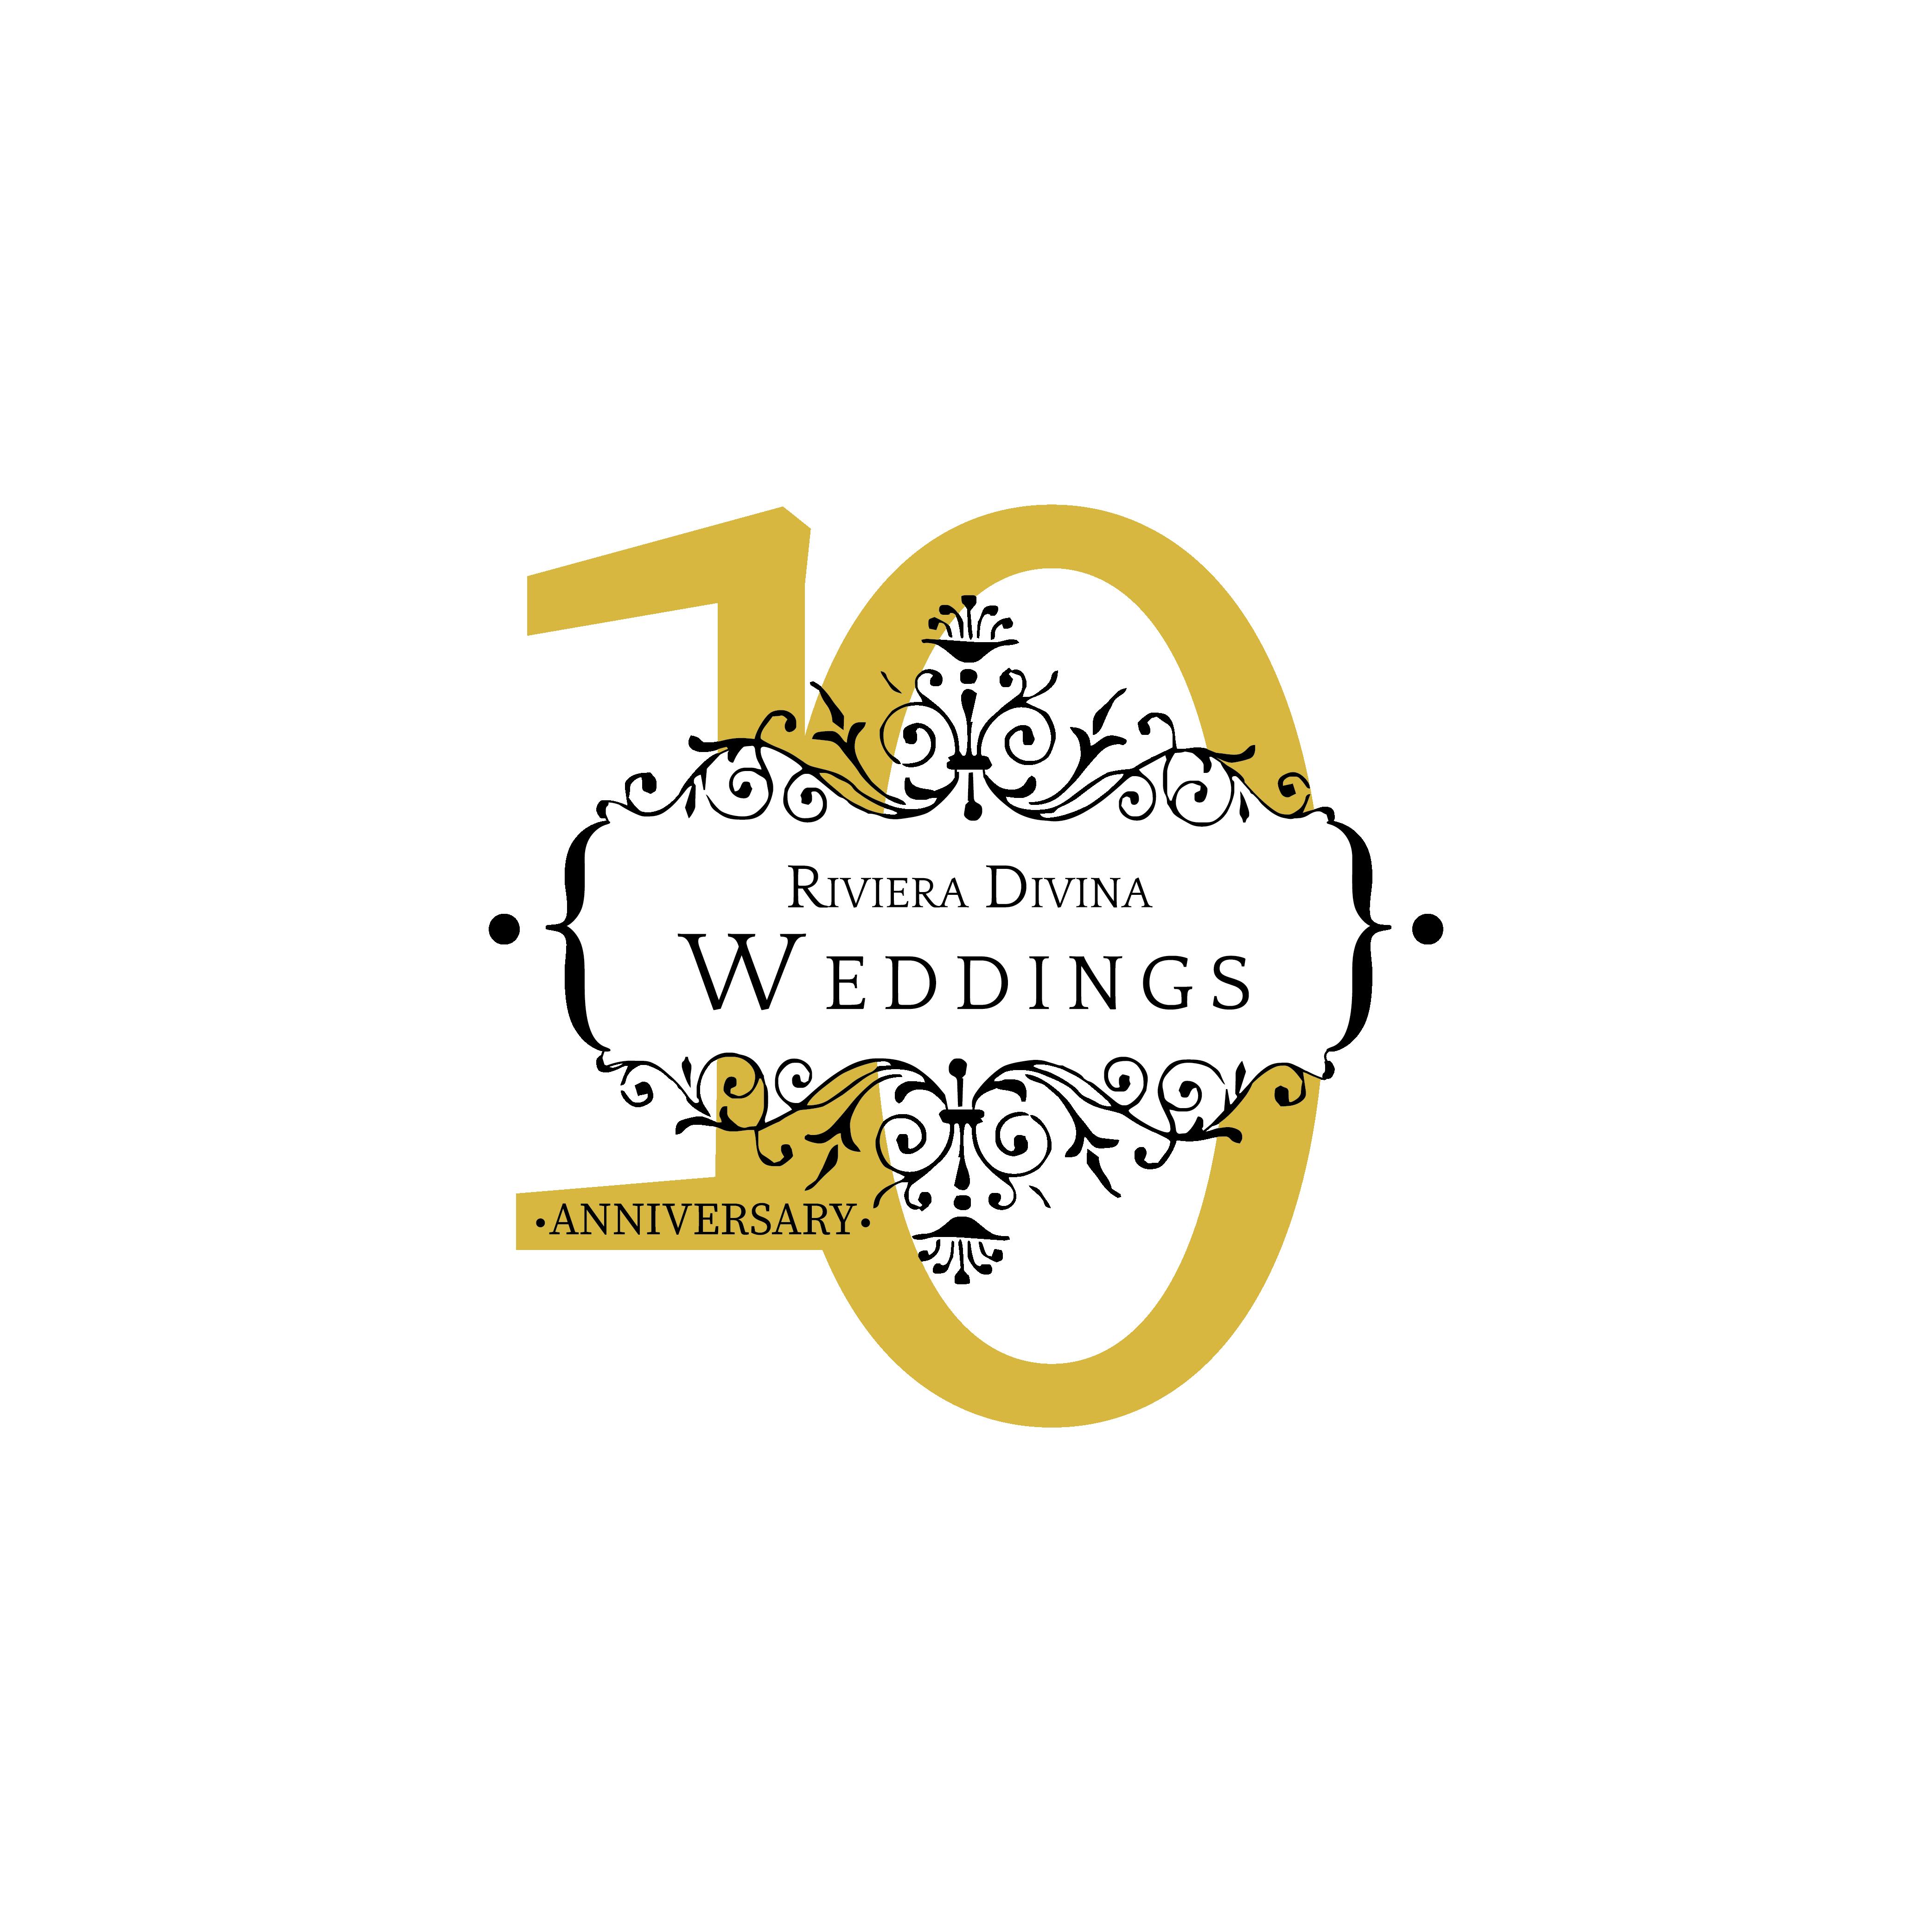 Riviera Divina Weddings 10th anniversary